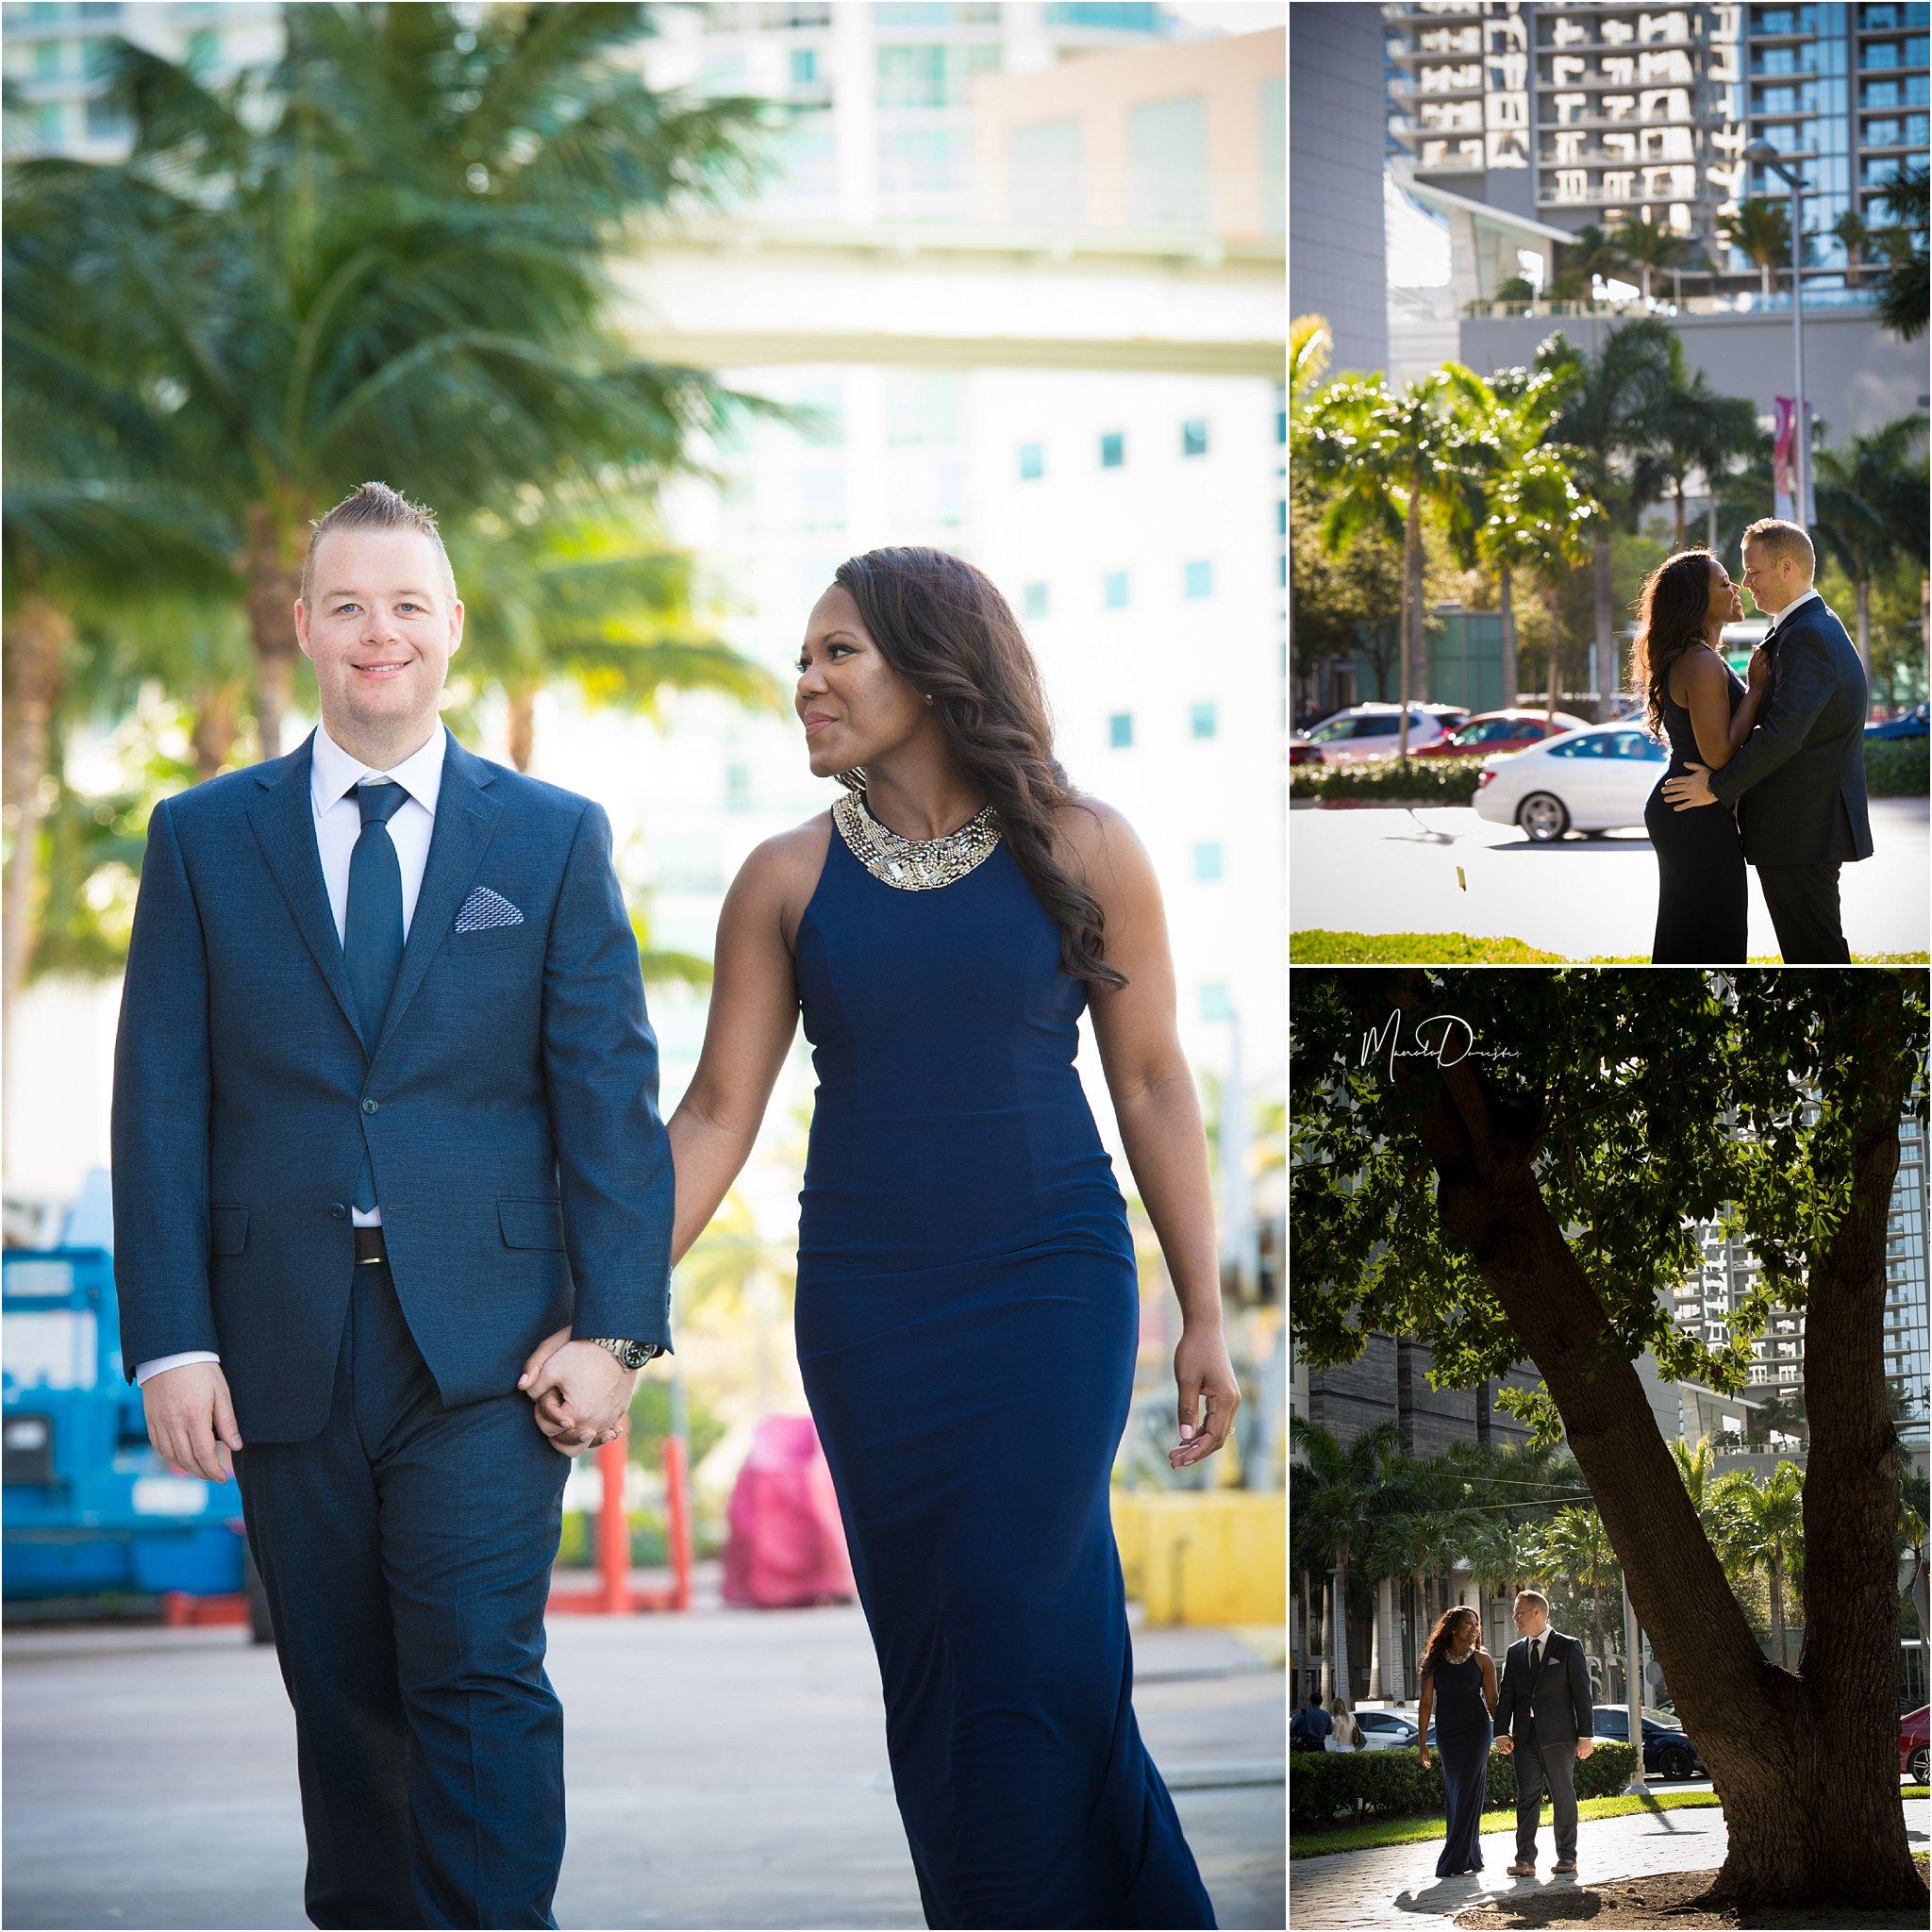 0700_ManoloDoreste_InFocusStudios_Wedding_Family_Photography_Miami_MiamiPhotographer.jpg